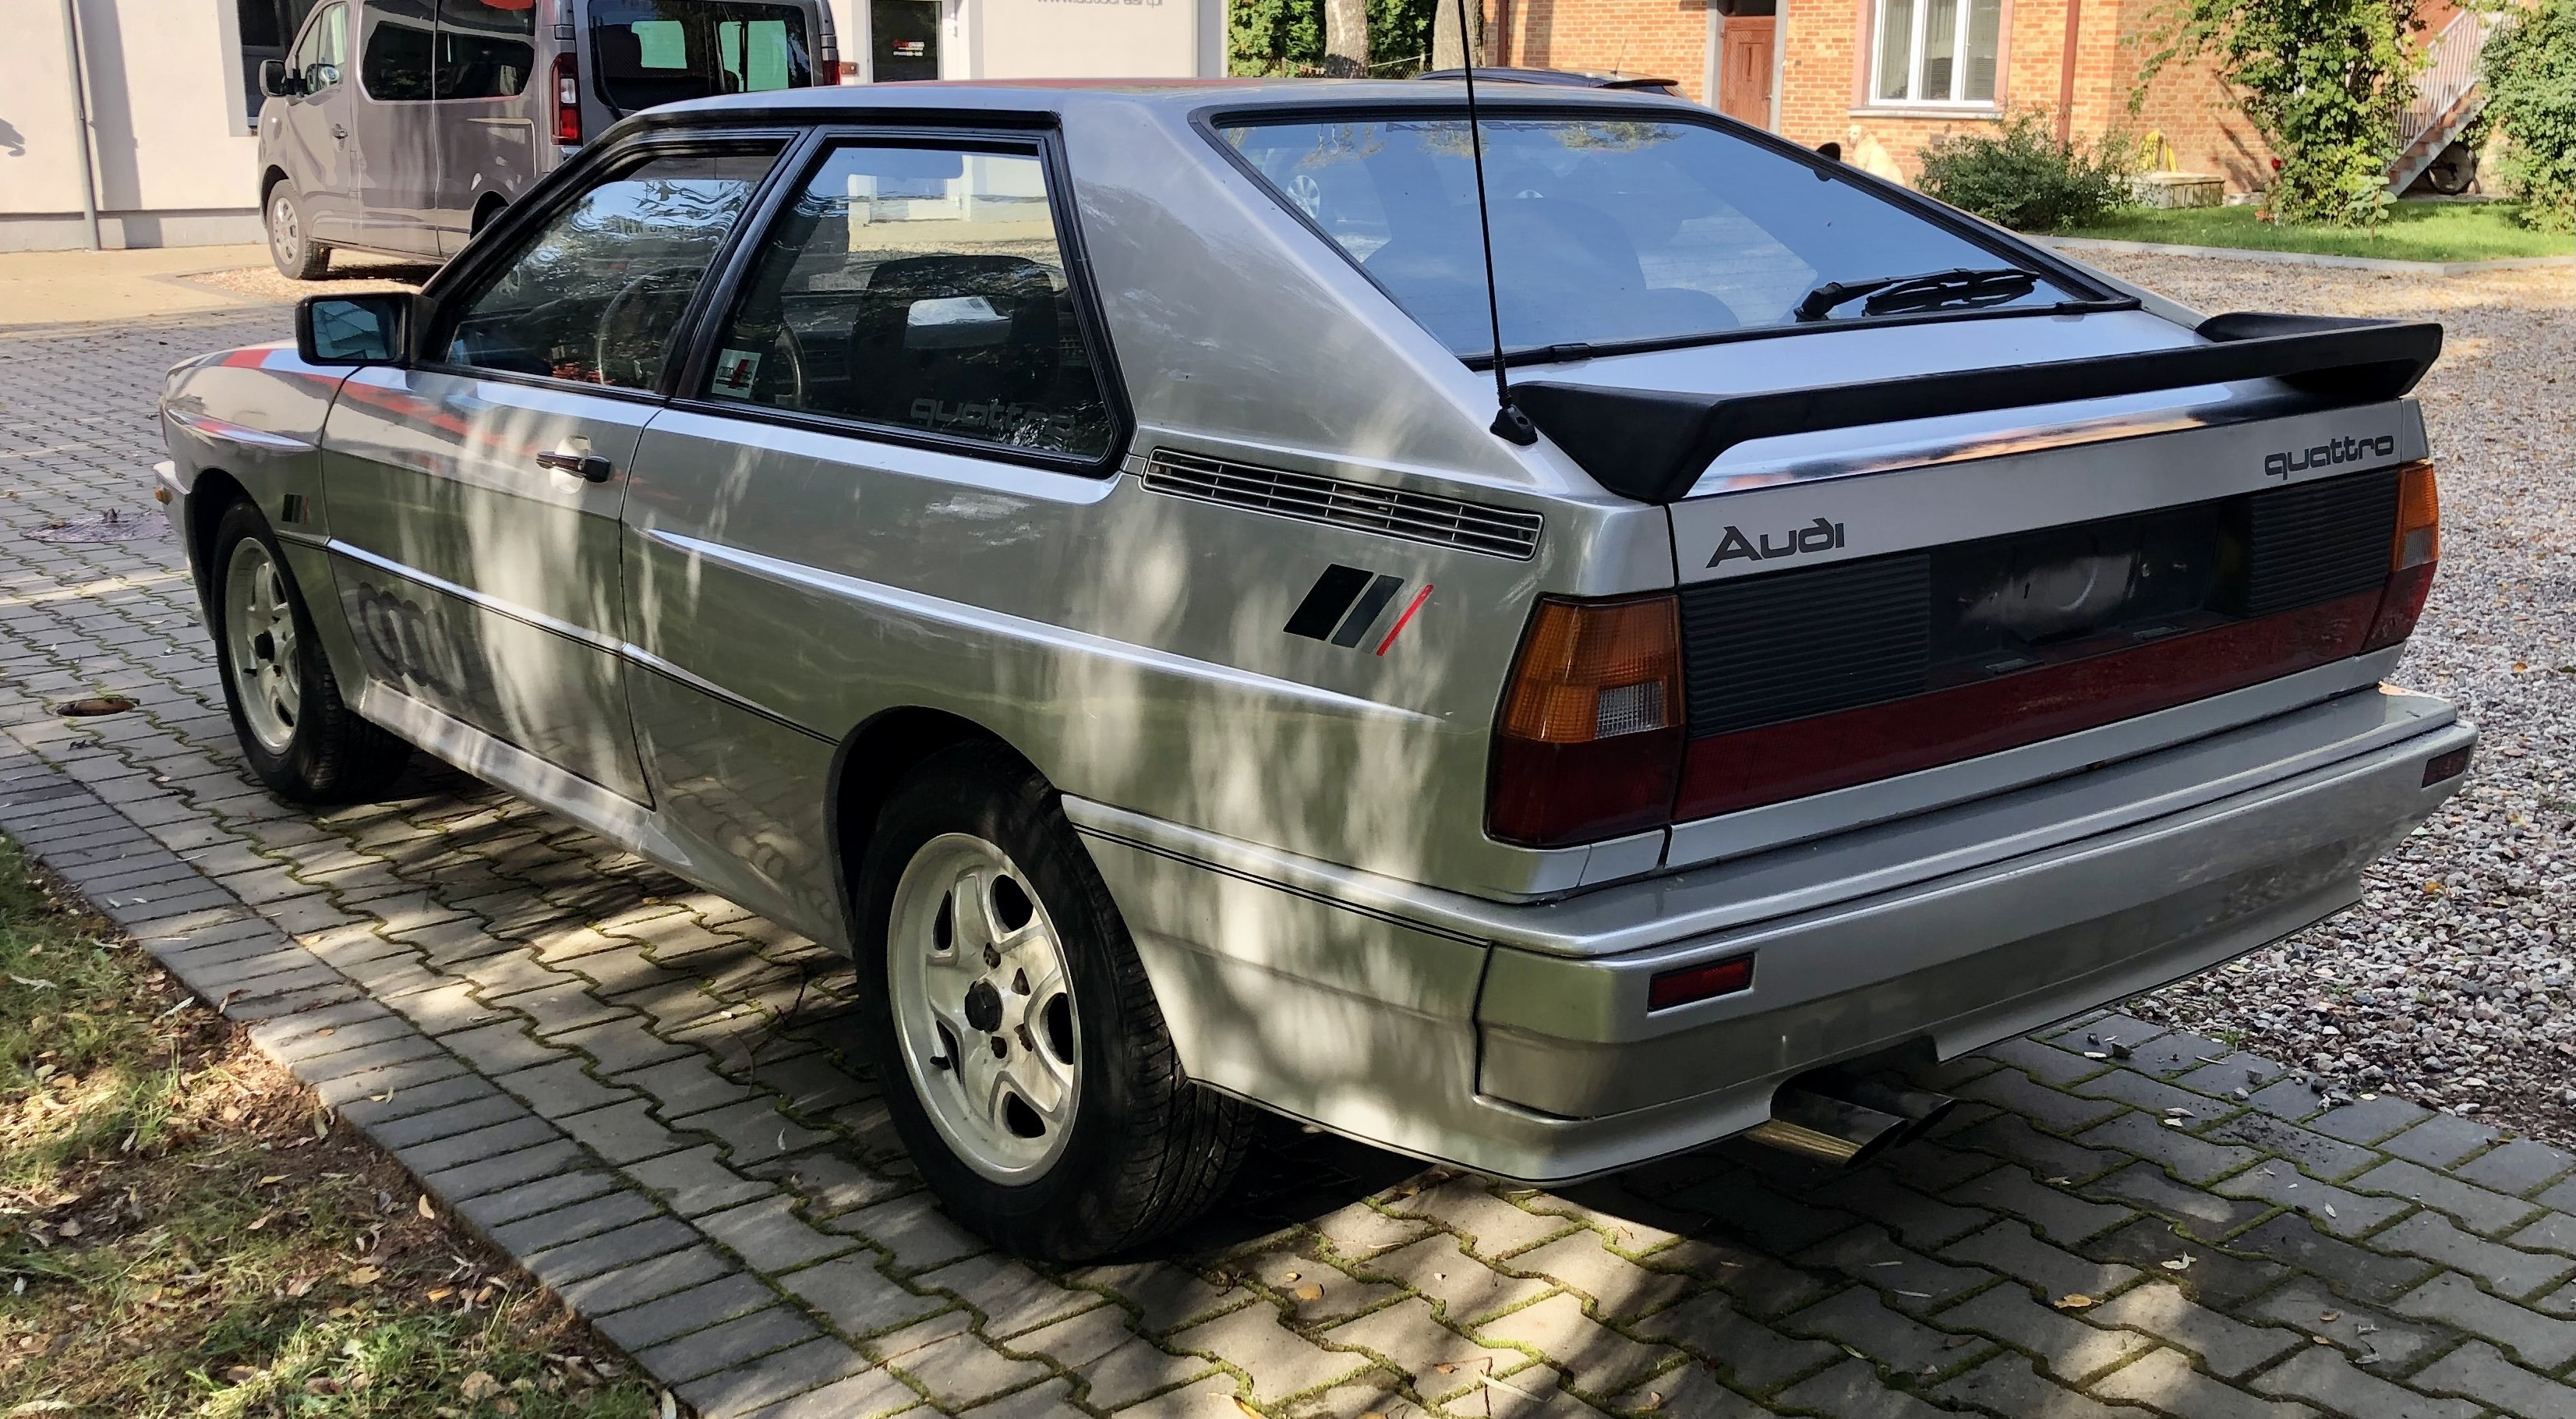 Picture of 1981 Audi Quattro - barnfind!